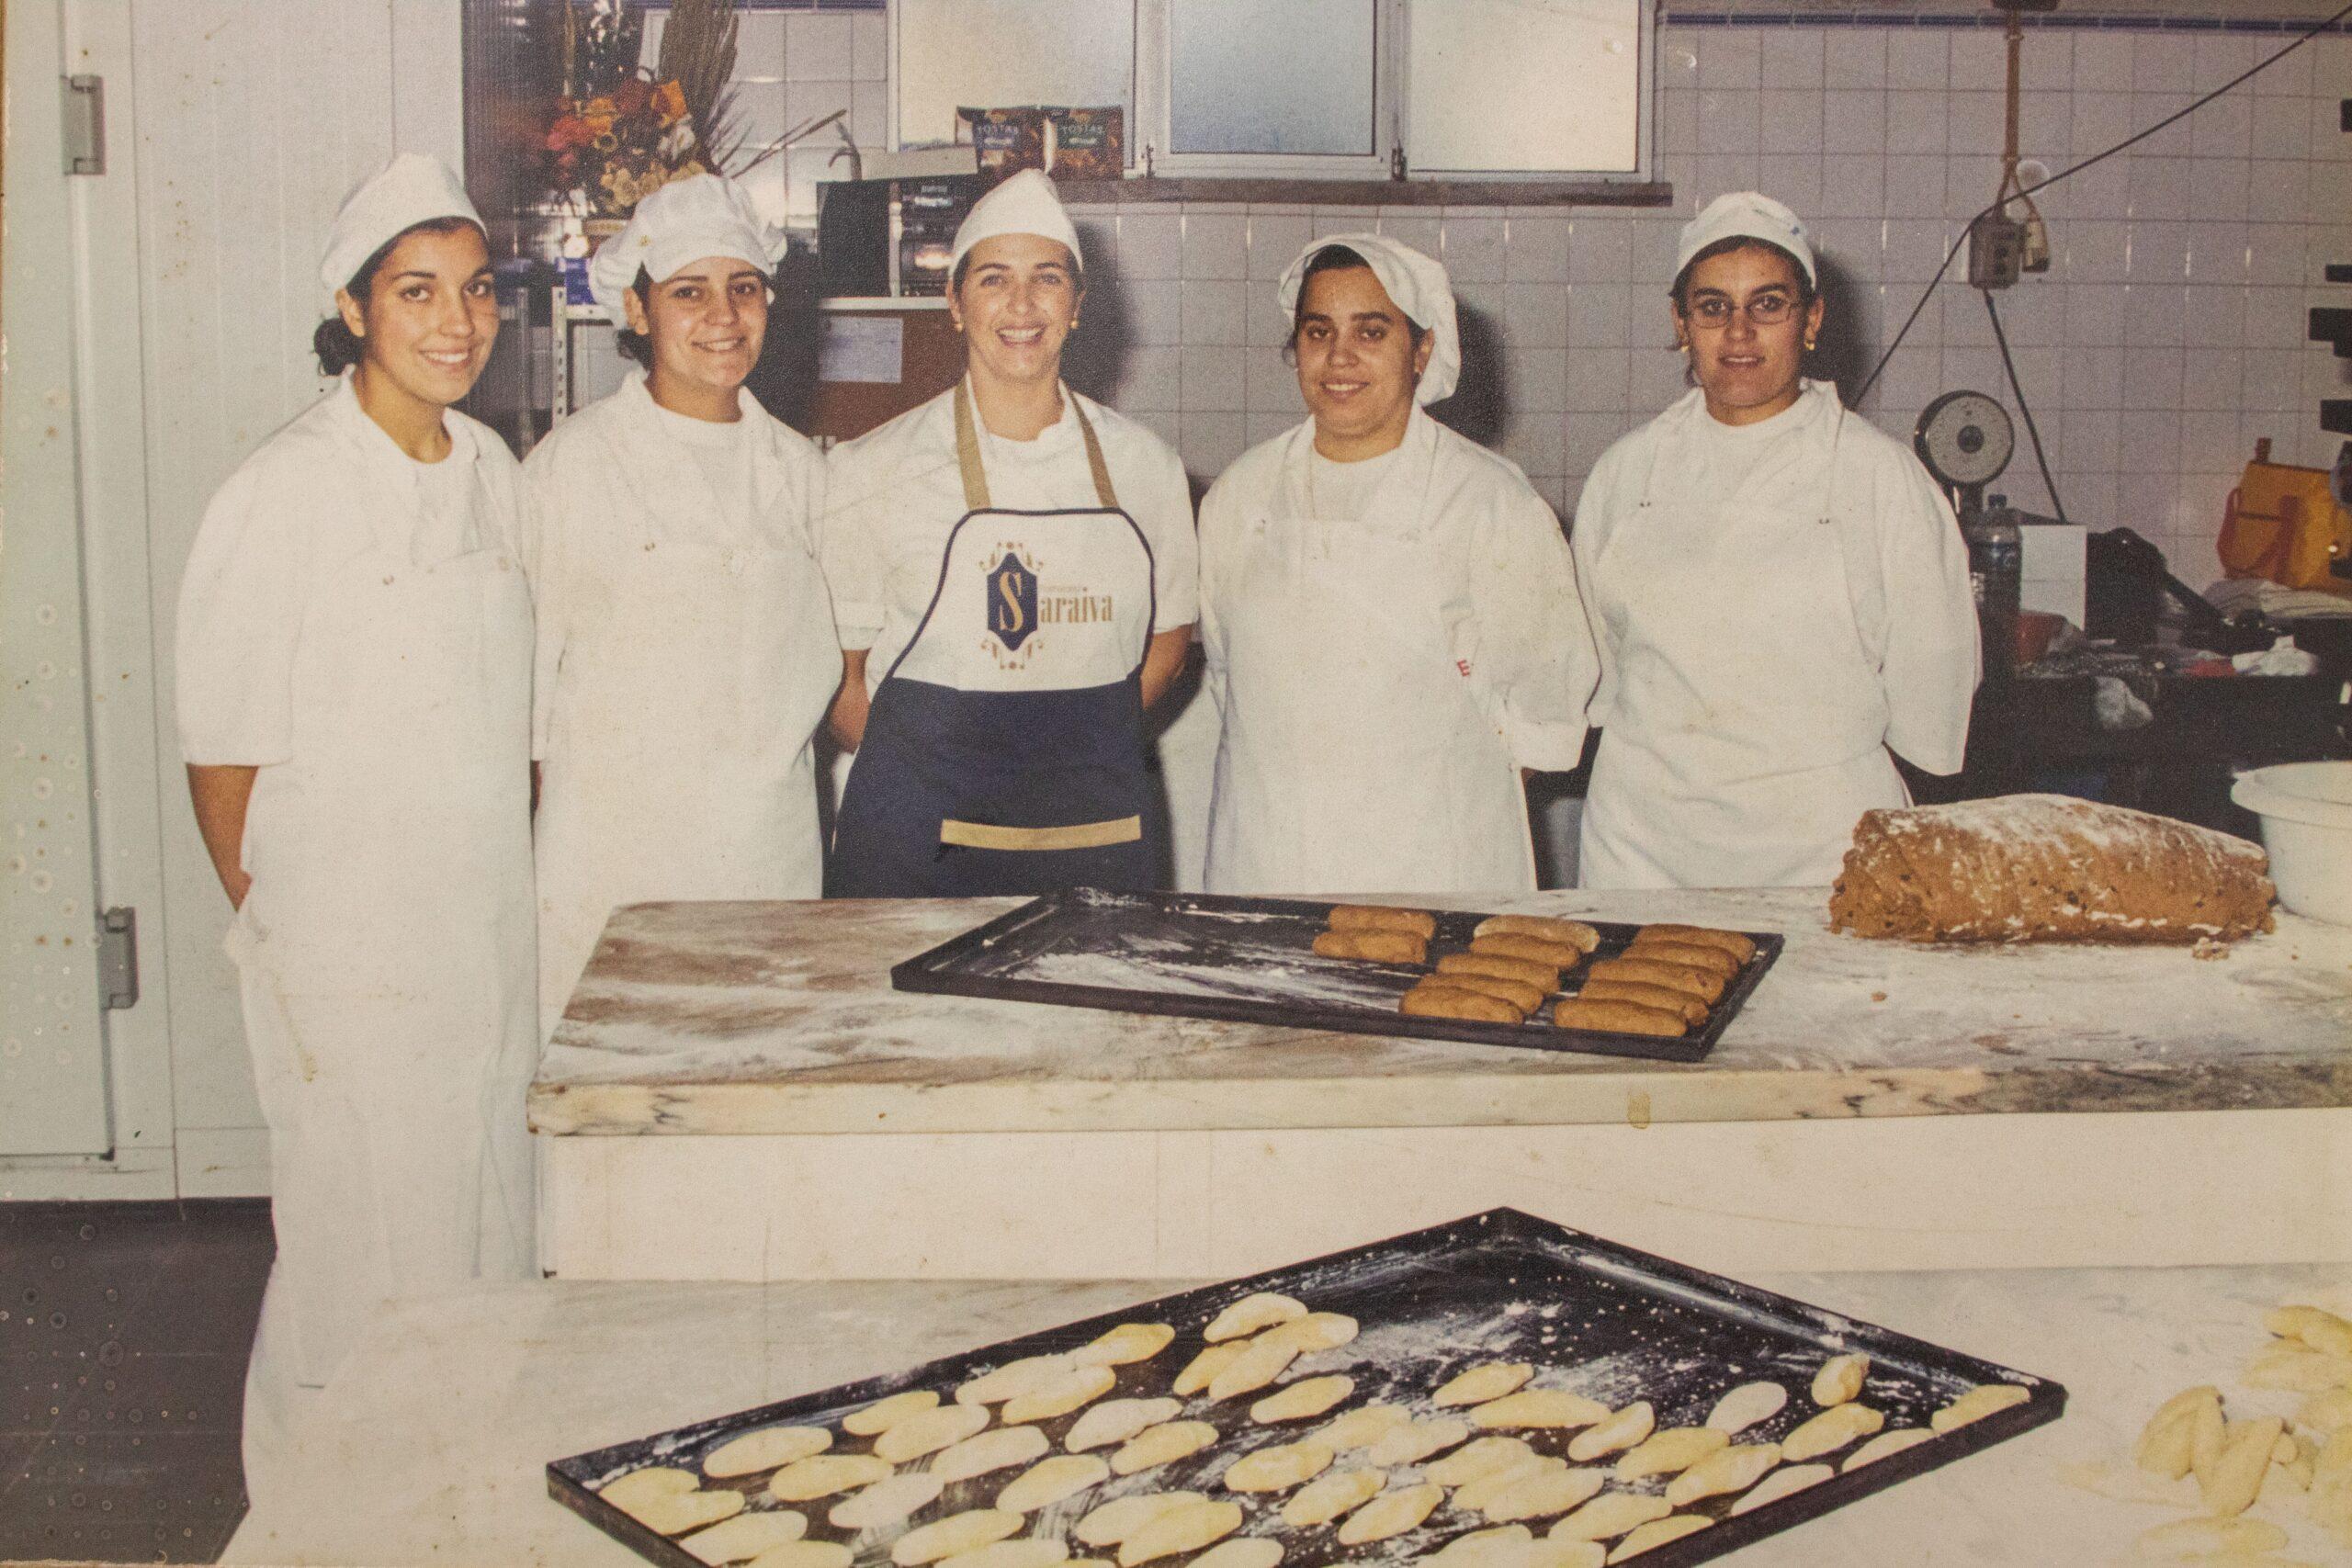 catarina-pastelaria-saraiva-atelier-doce-alfeizerao-doces-conventuais